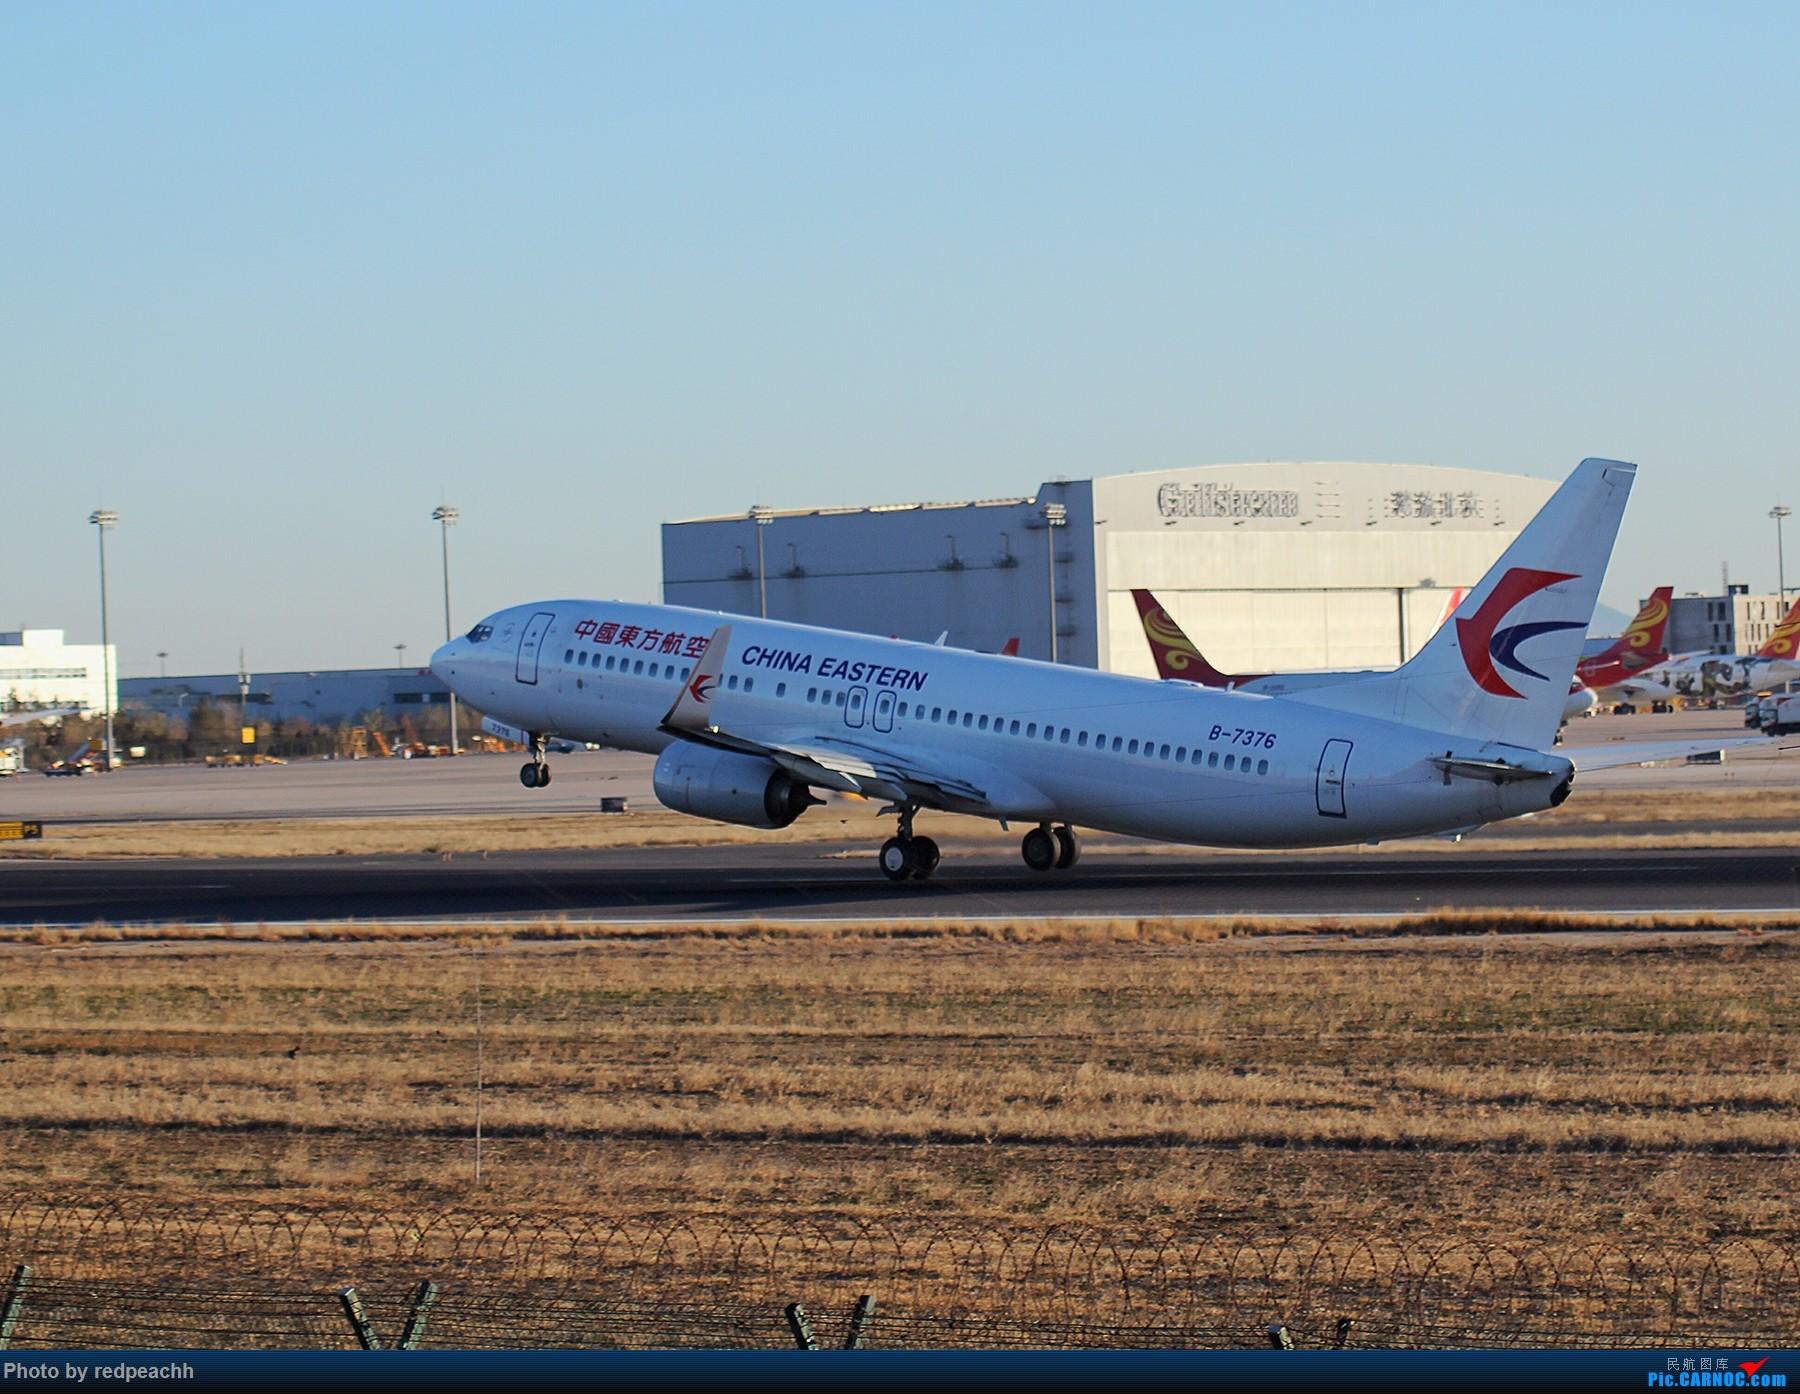 Re:[原创]河北人为拍机而首都机场2日游虽常规但值得纪念(36L) BOEING 737-800 B-7379 中国北京首都国际机场